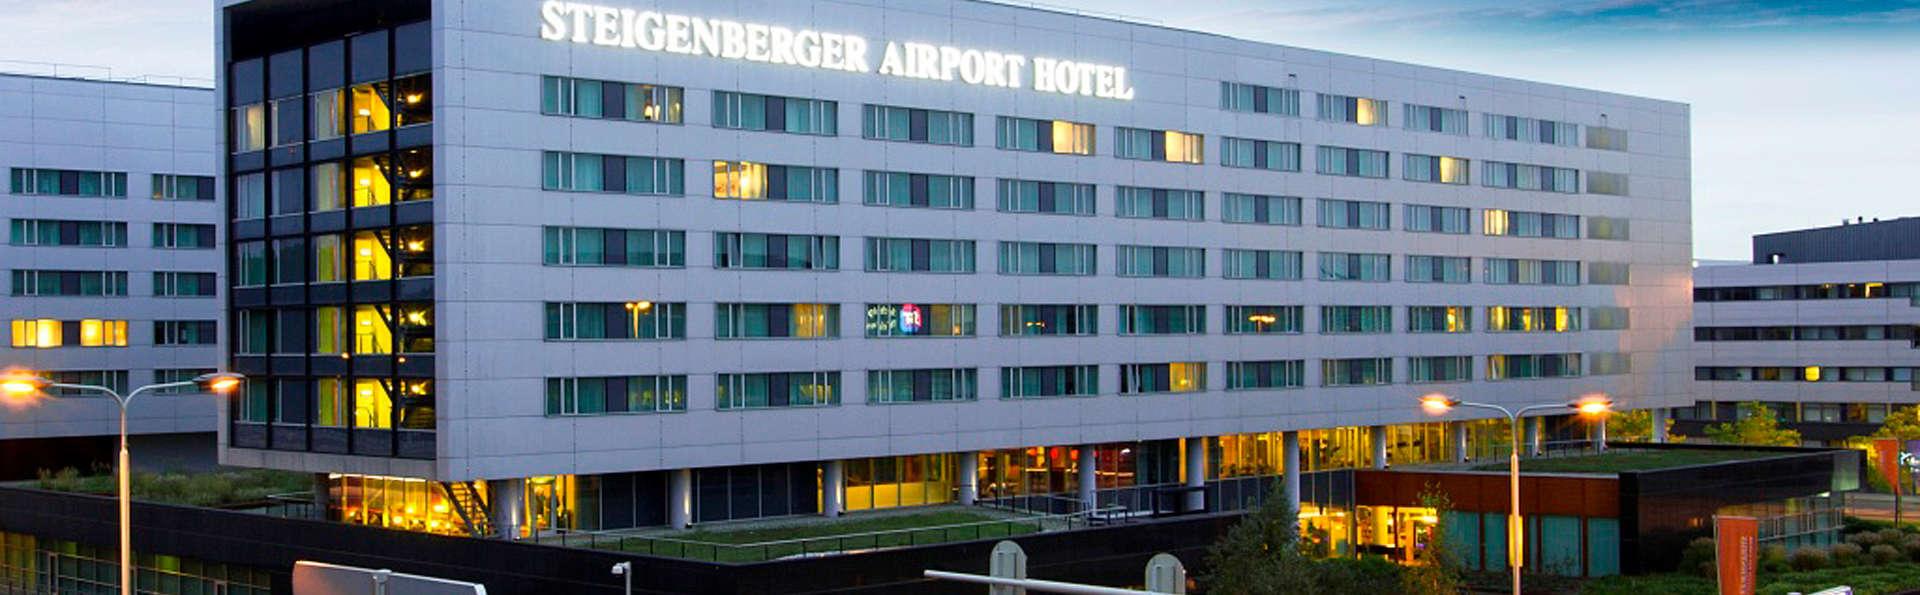 Steigenberger Airport Hotel Amsterdam - edit_front3.jpg